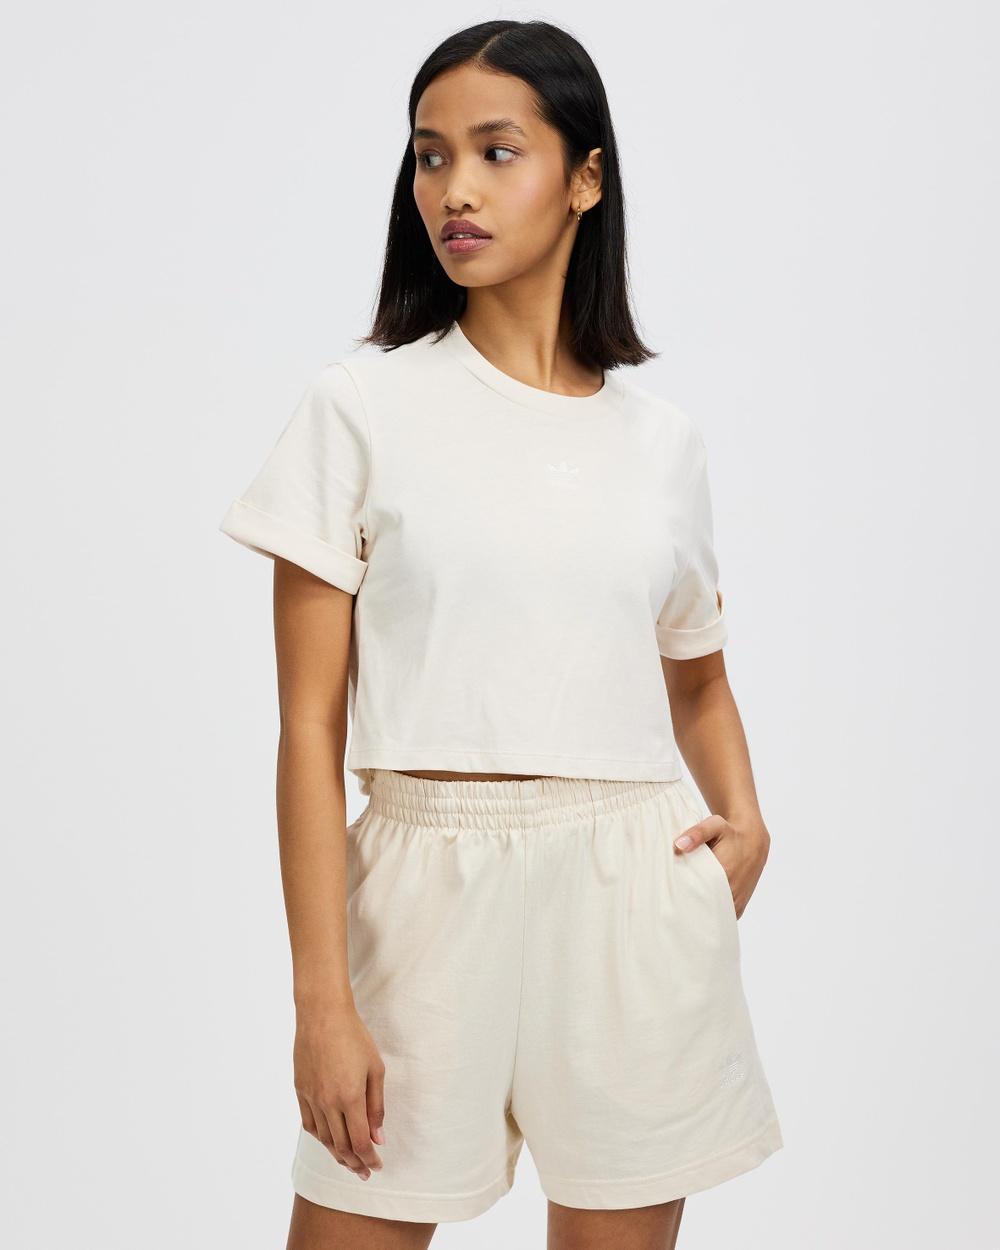 adidas Originals Adicolor Essentials Cropped Tee T-Shirts & Singlets Wonder White